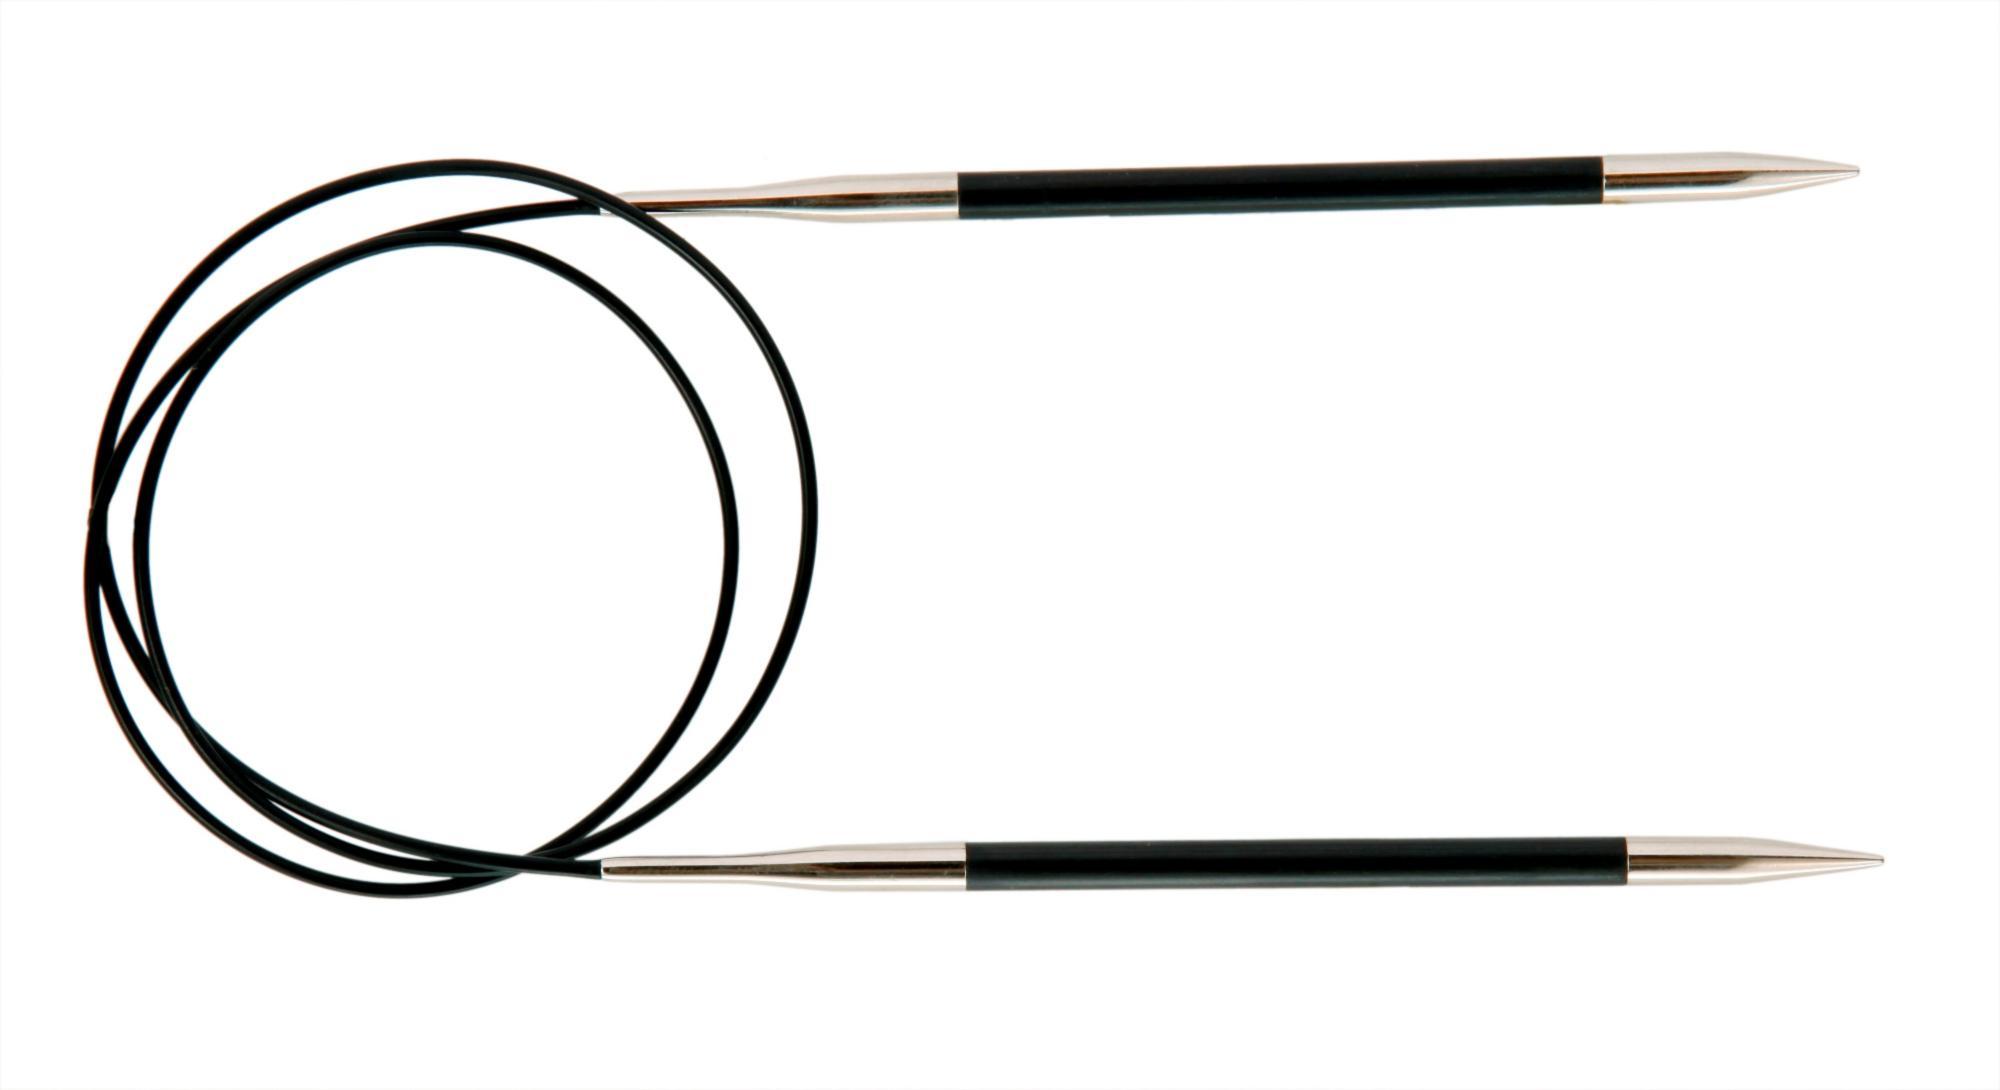 Спицы круговые 40 см Karbonz KnitPro, 41145, 3.25 мм